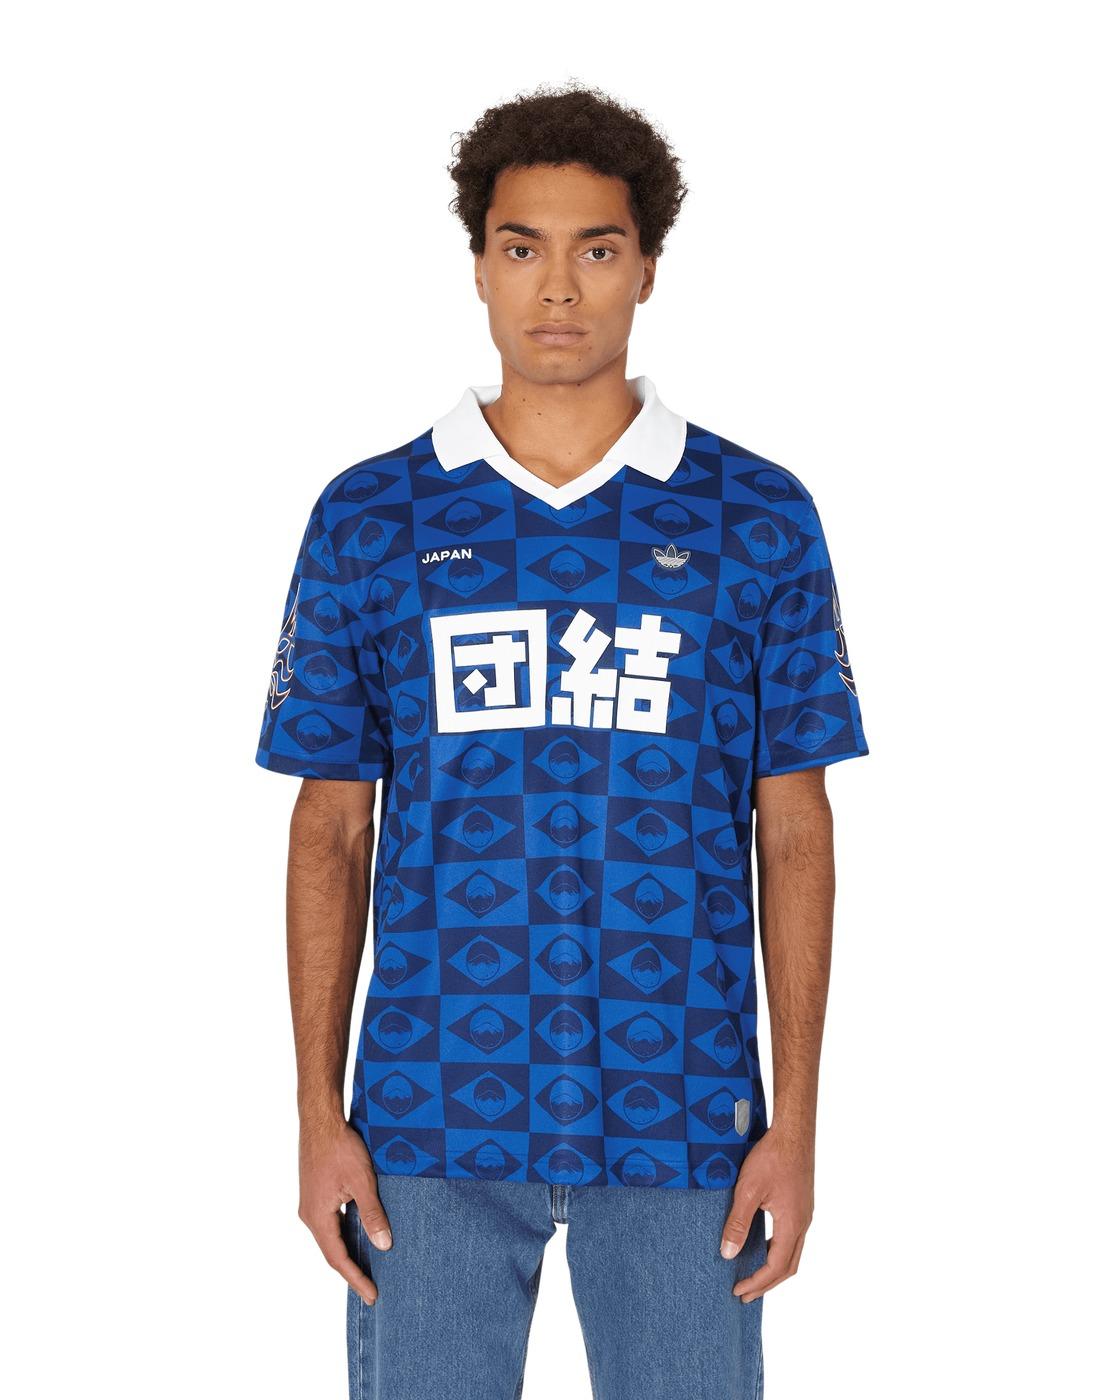 Adidas Originals Japan Jersey T Shirt Dark Blue